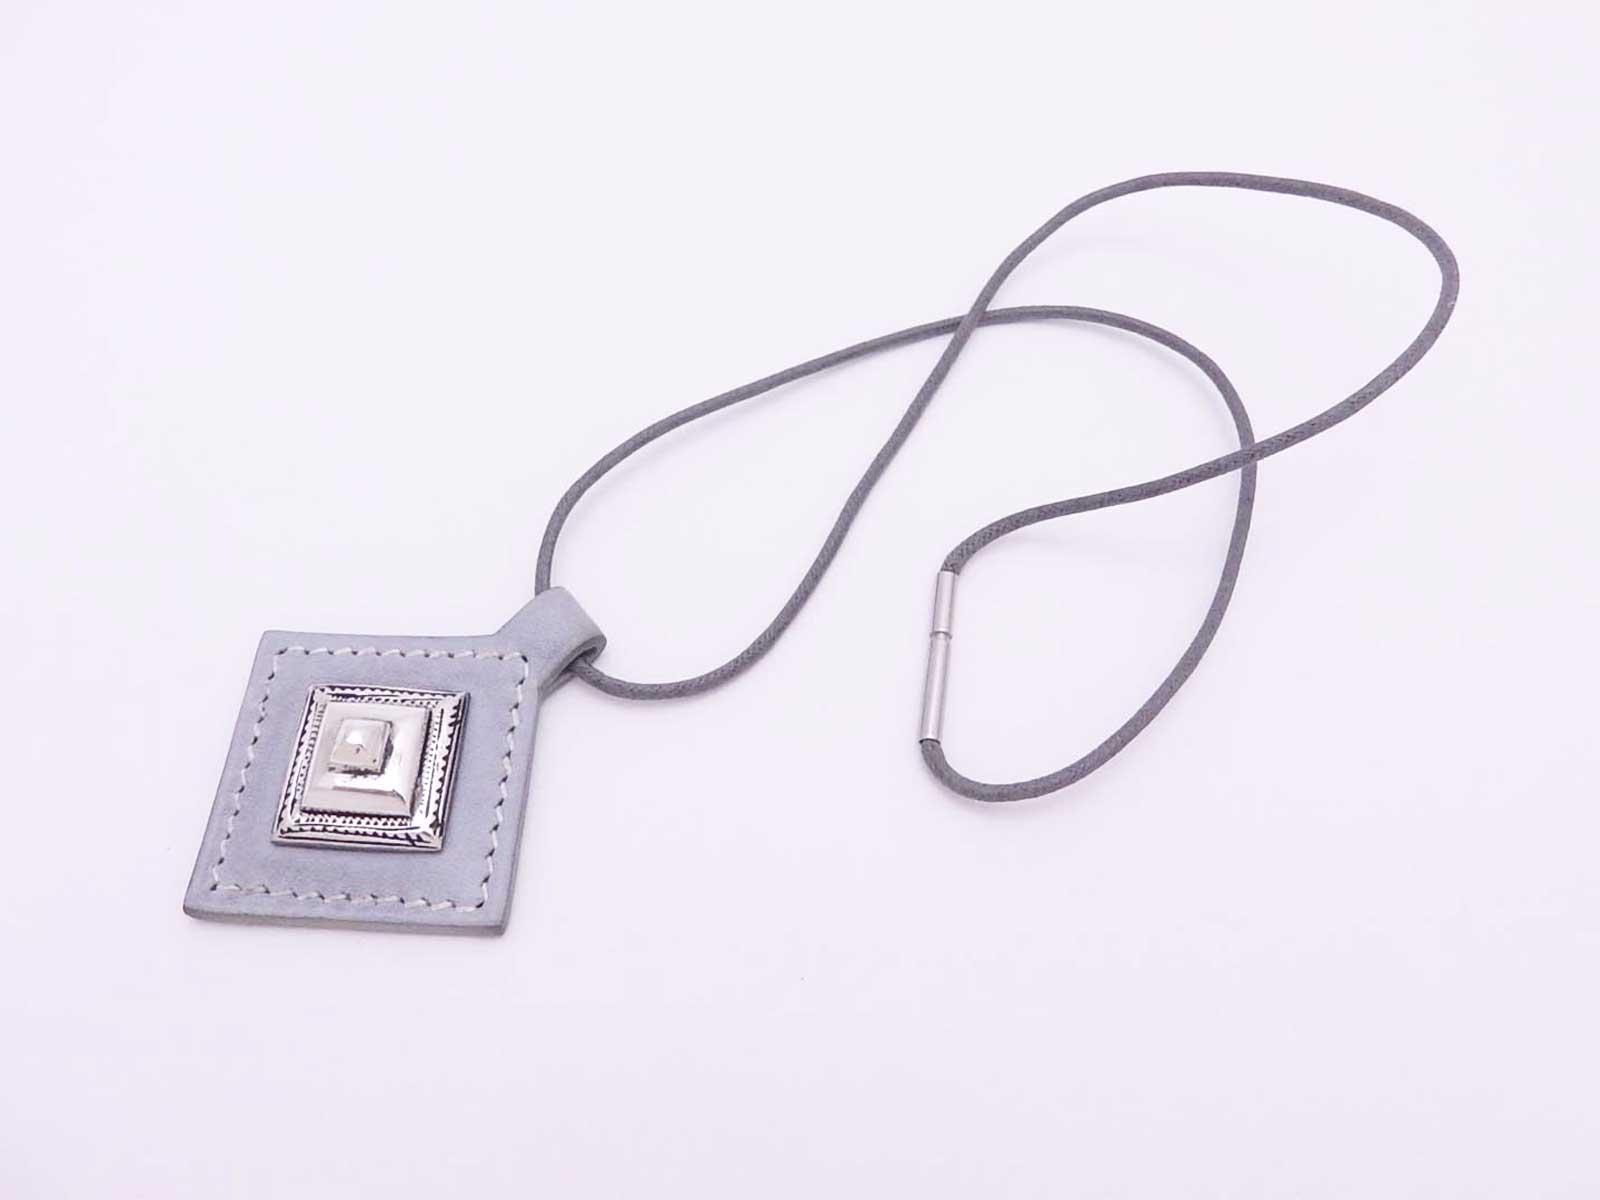 fd21775ed Details about Auth HERMES Touareg Pendant Necklace Light Blue Gray Leather/Silver  925 - e37763